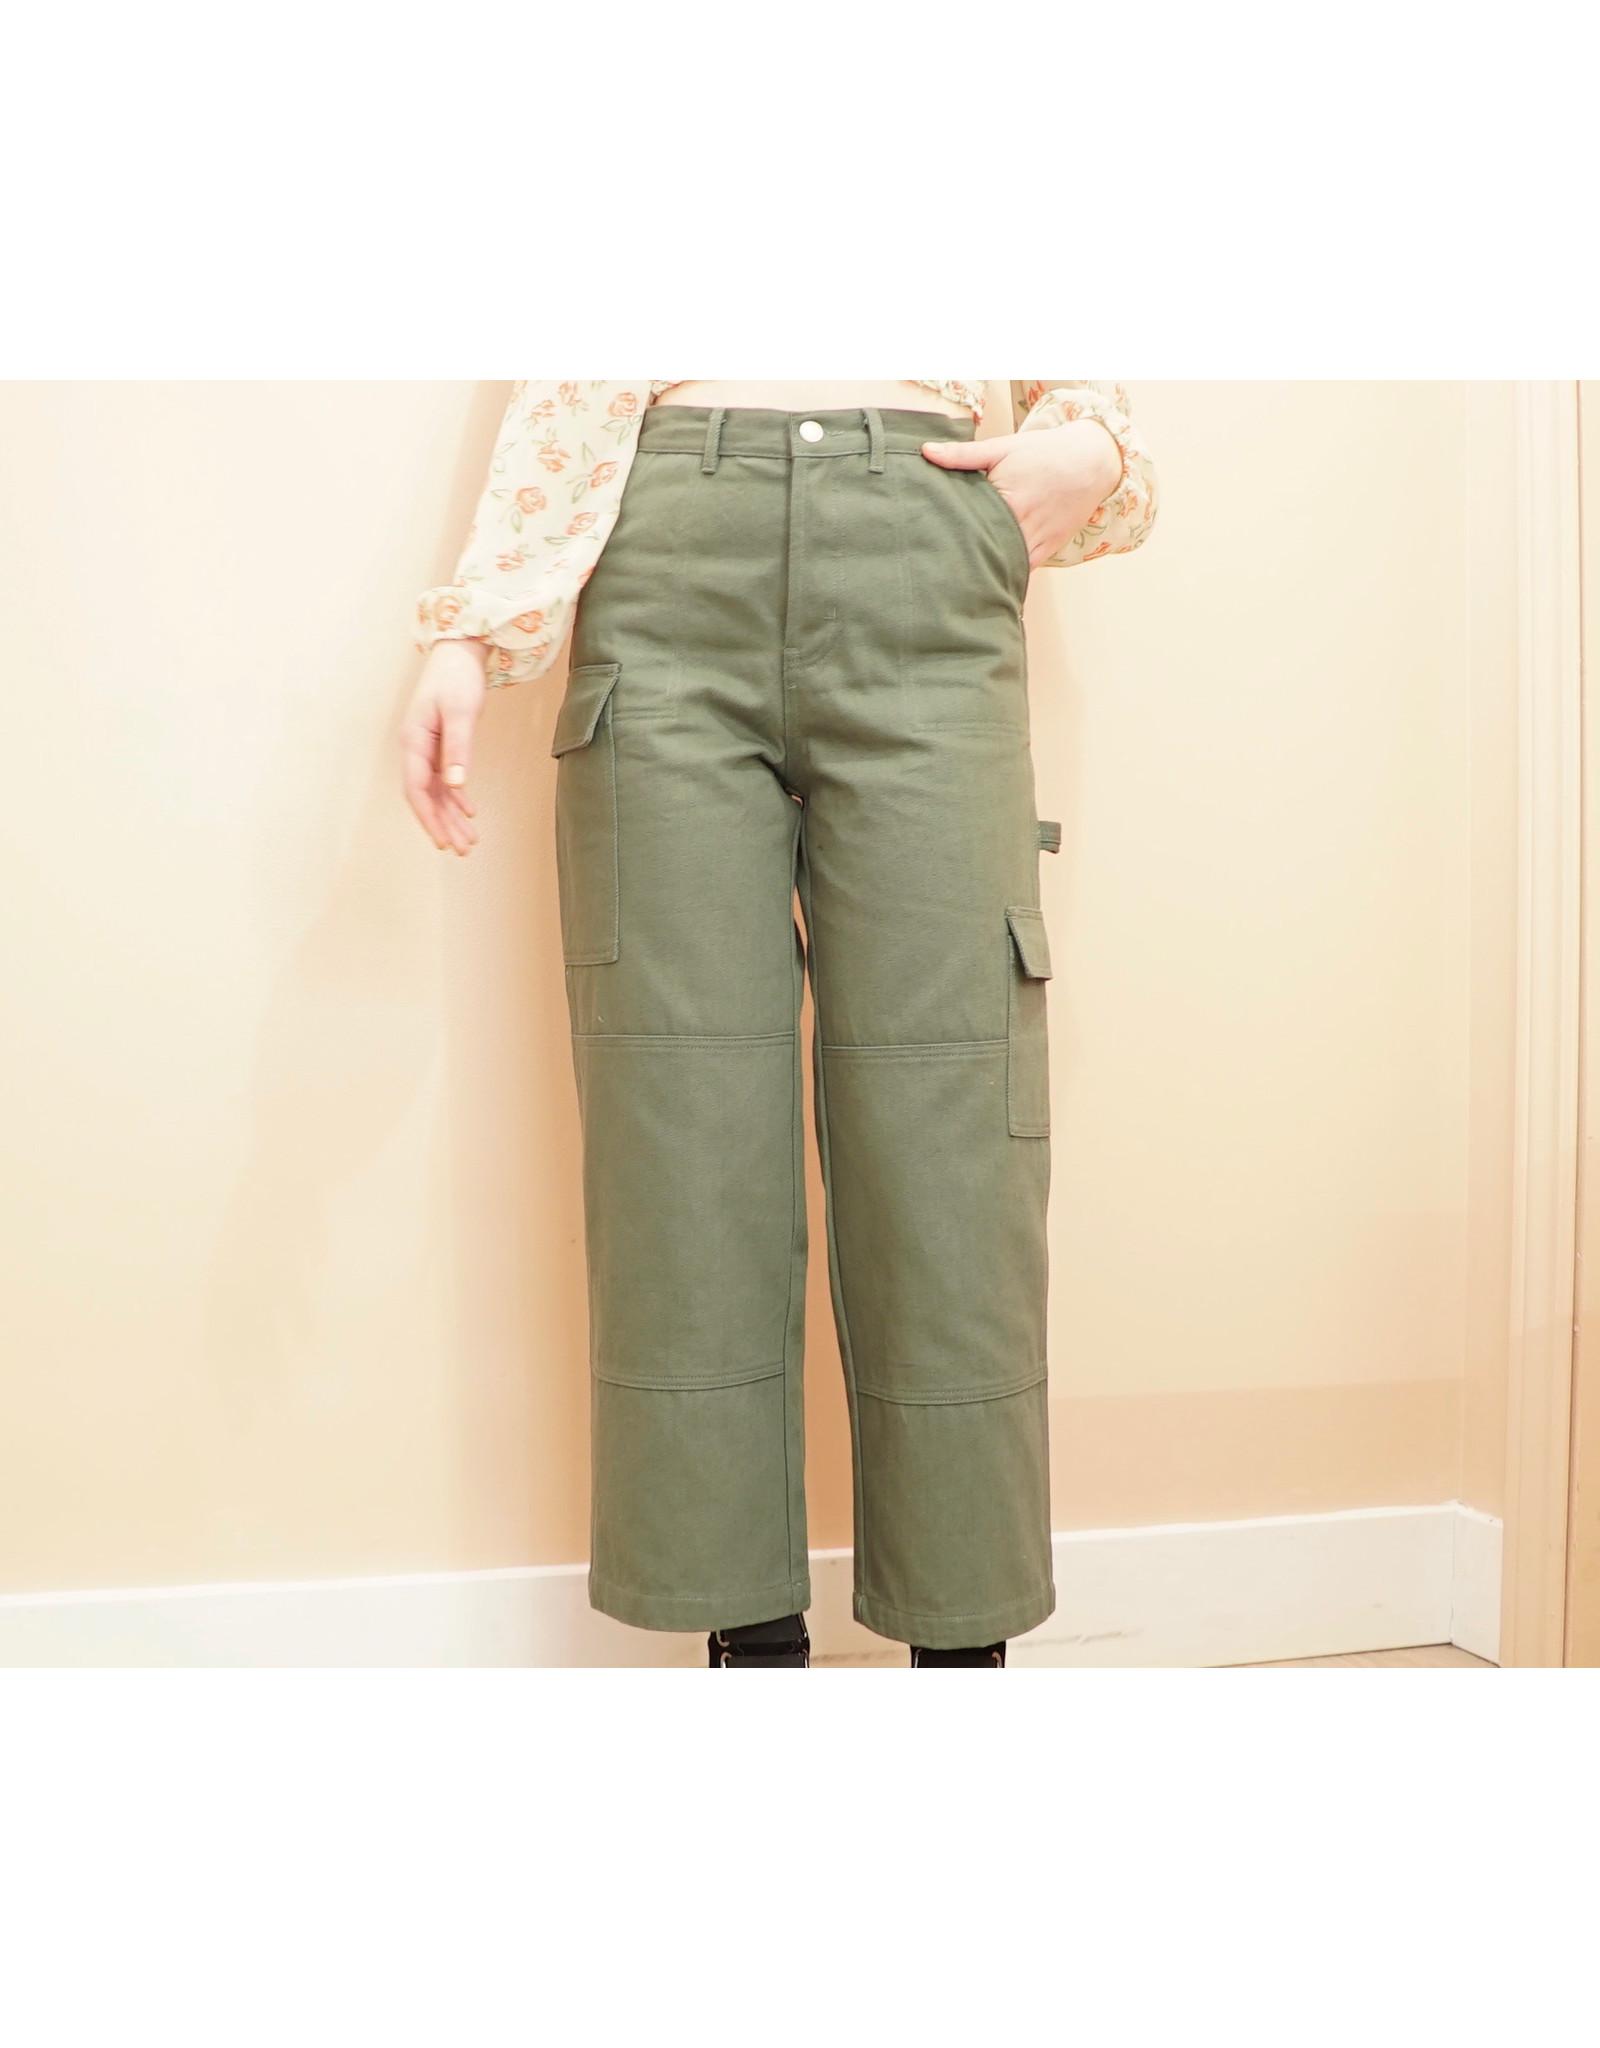 No Less Than - Denim Pocket Pant